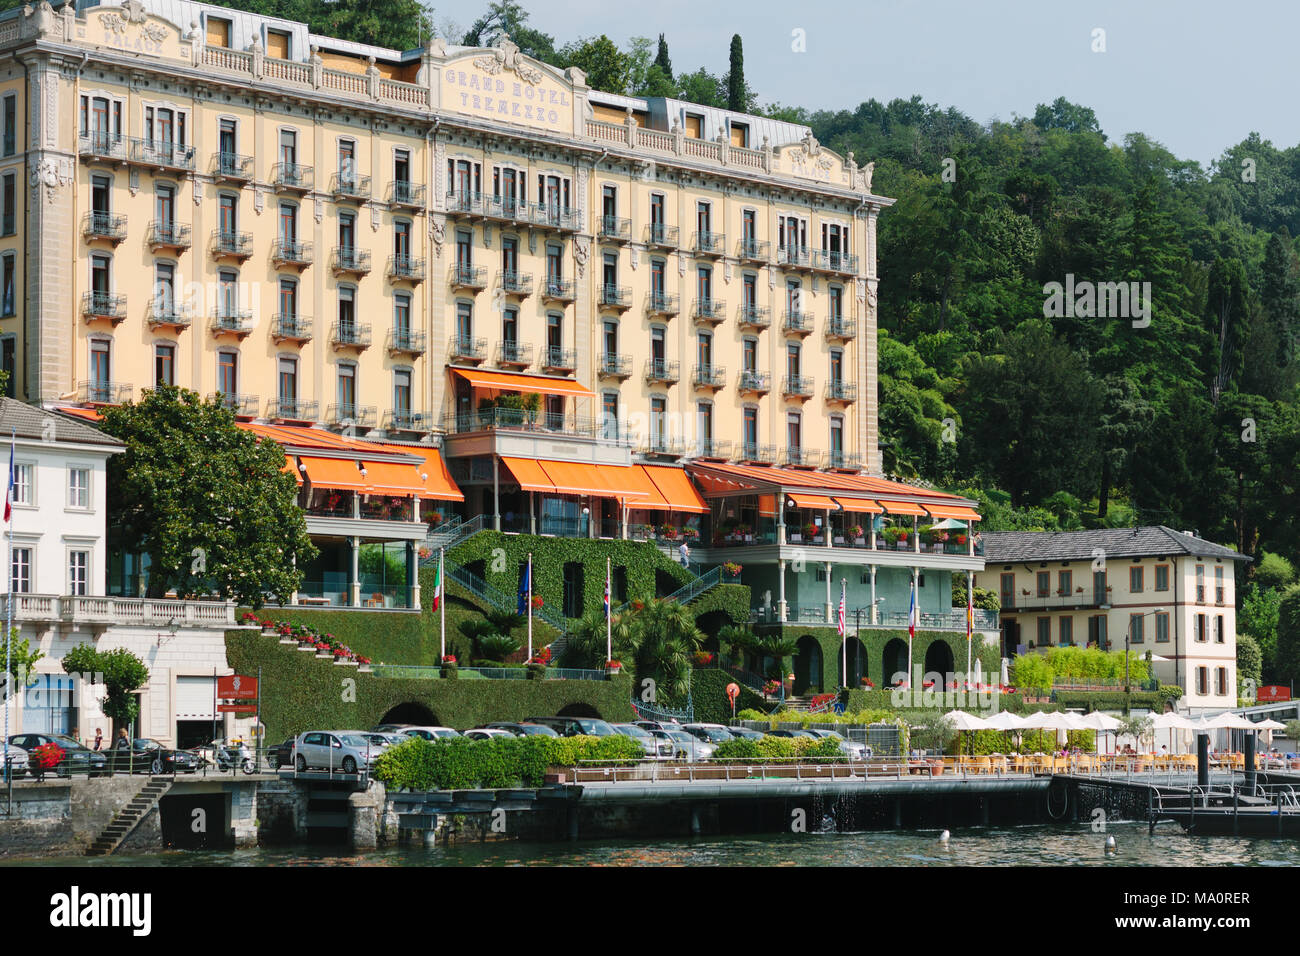 The Grand Hotel Tremezzo Viewed From Lake Como Italy Stock Photo Alamy